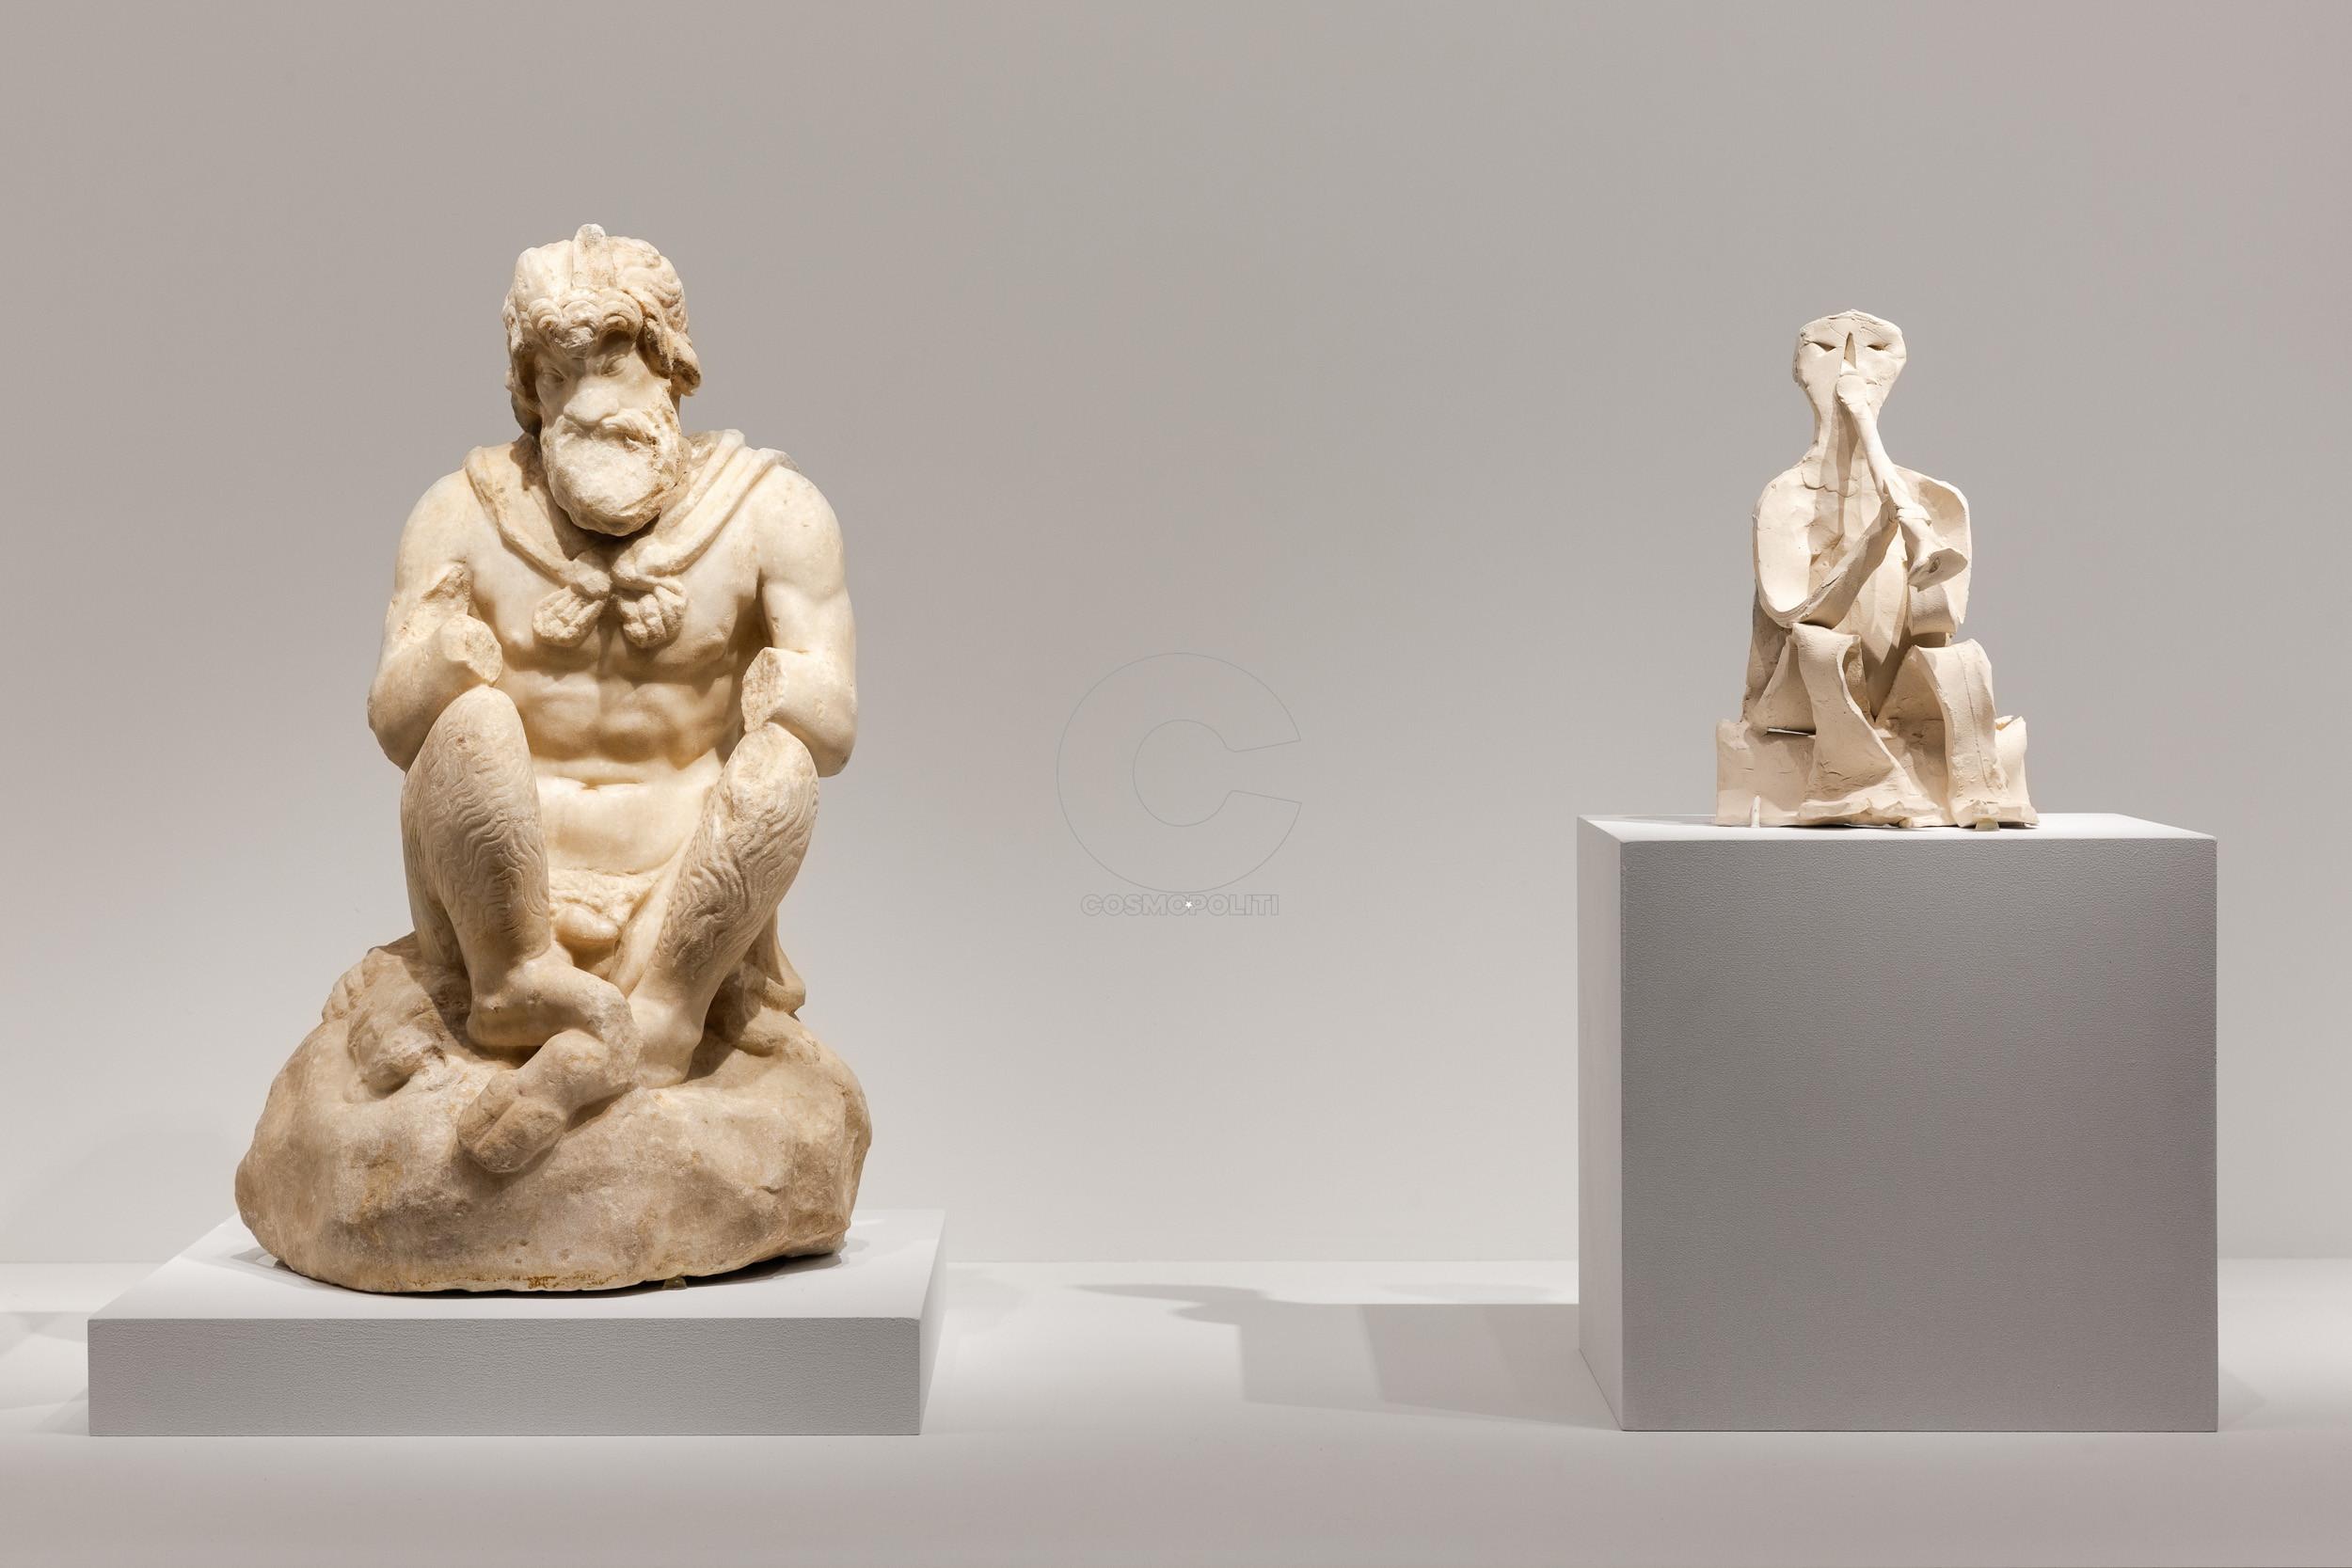 5_MUSEUM OF CYCLADIC ART© PHOTO PARIS TAVITIAN